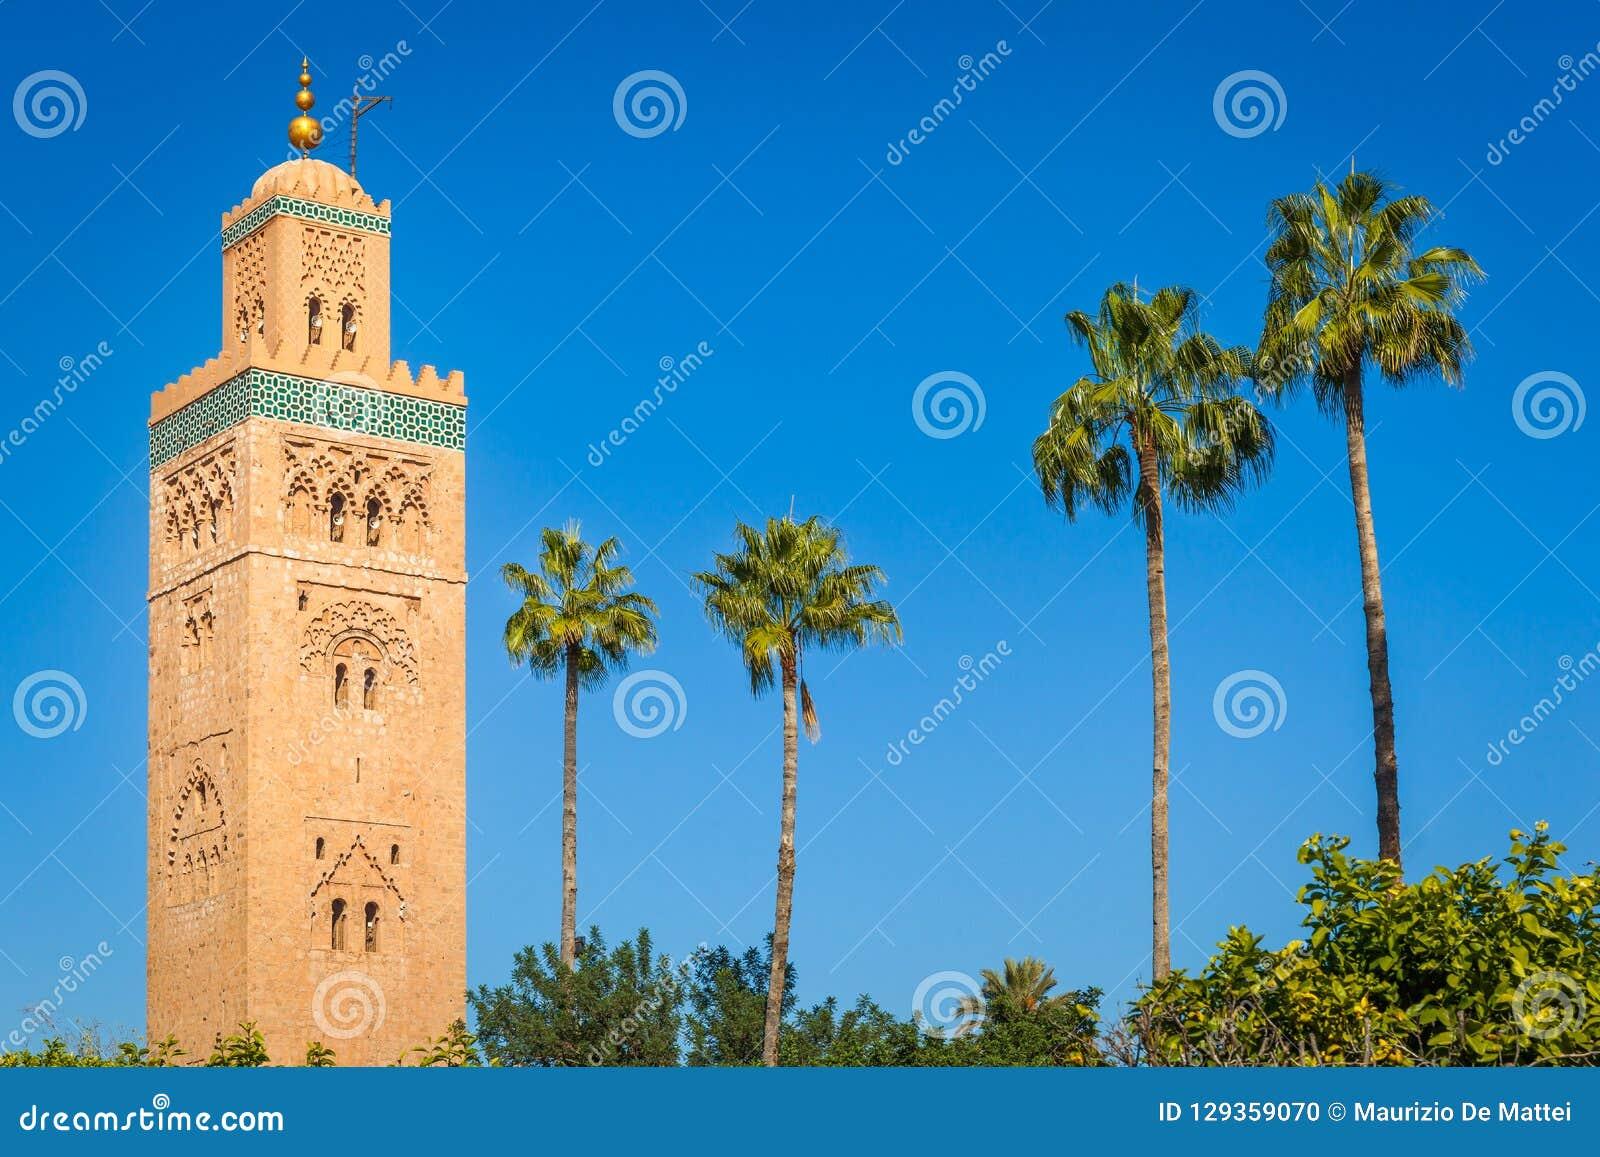 Historic minaret and palm trees